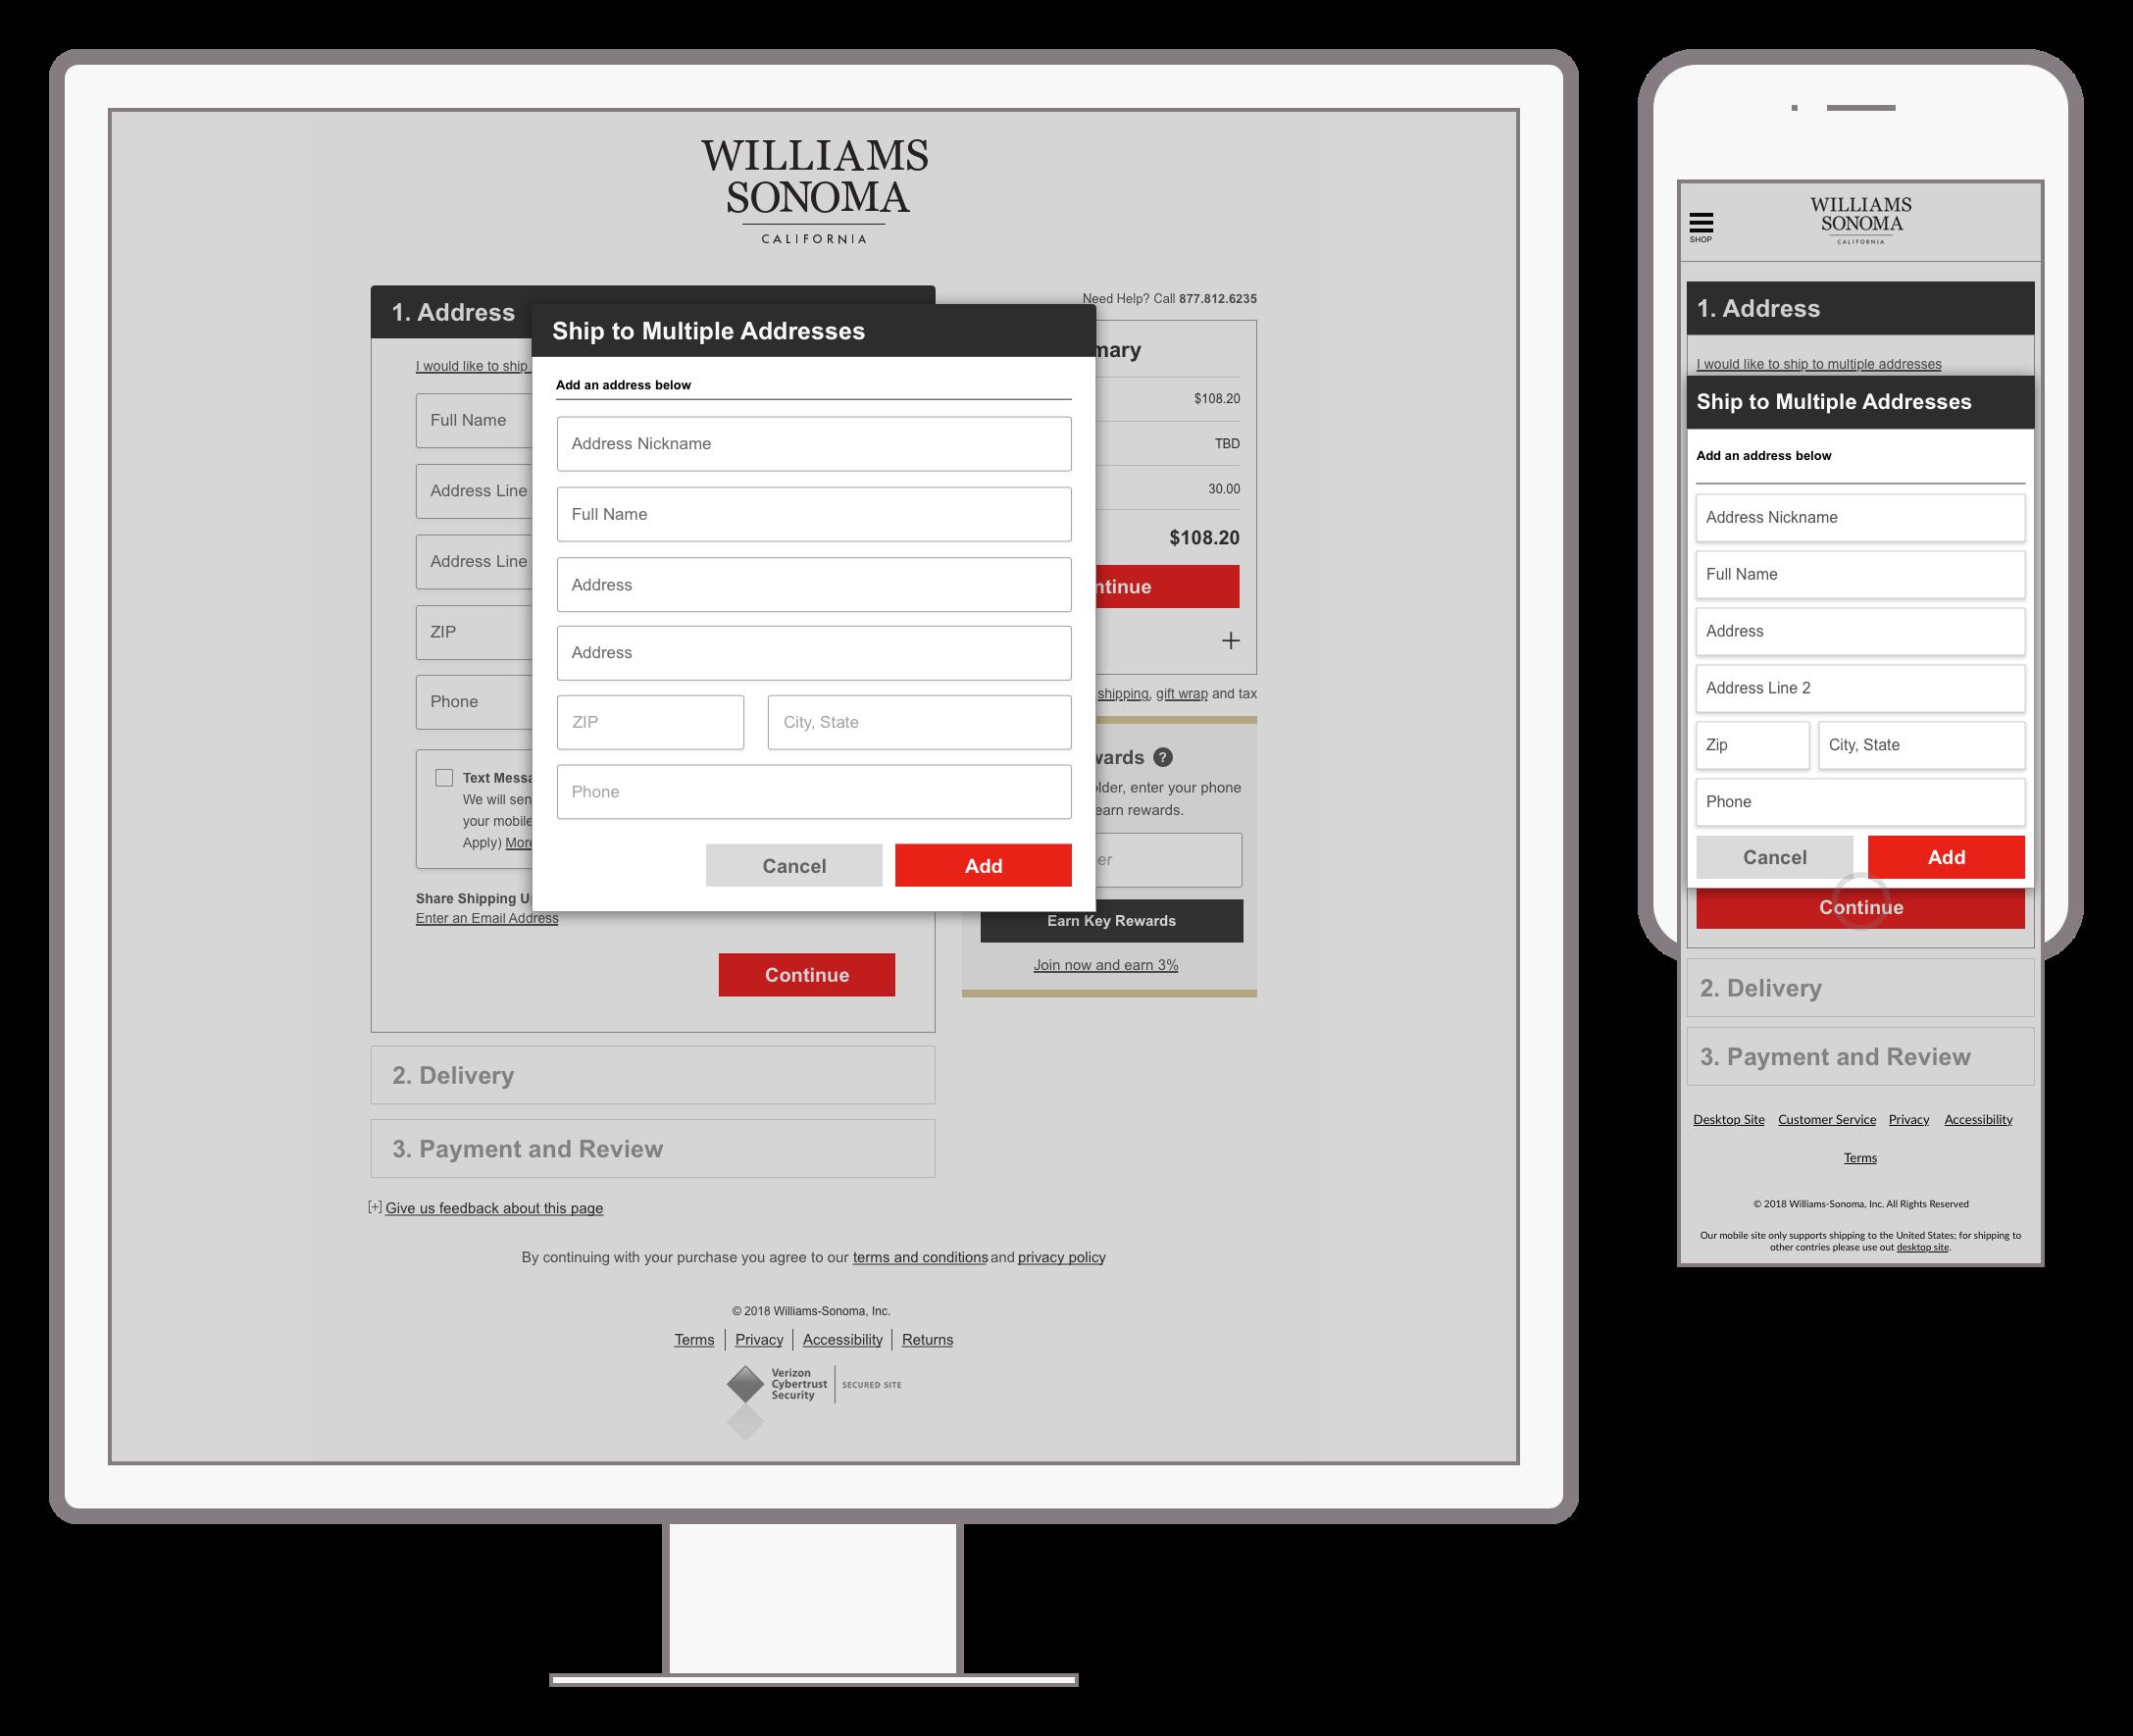 Shipping - Multiple Address - Enter